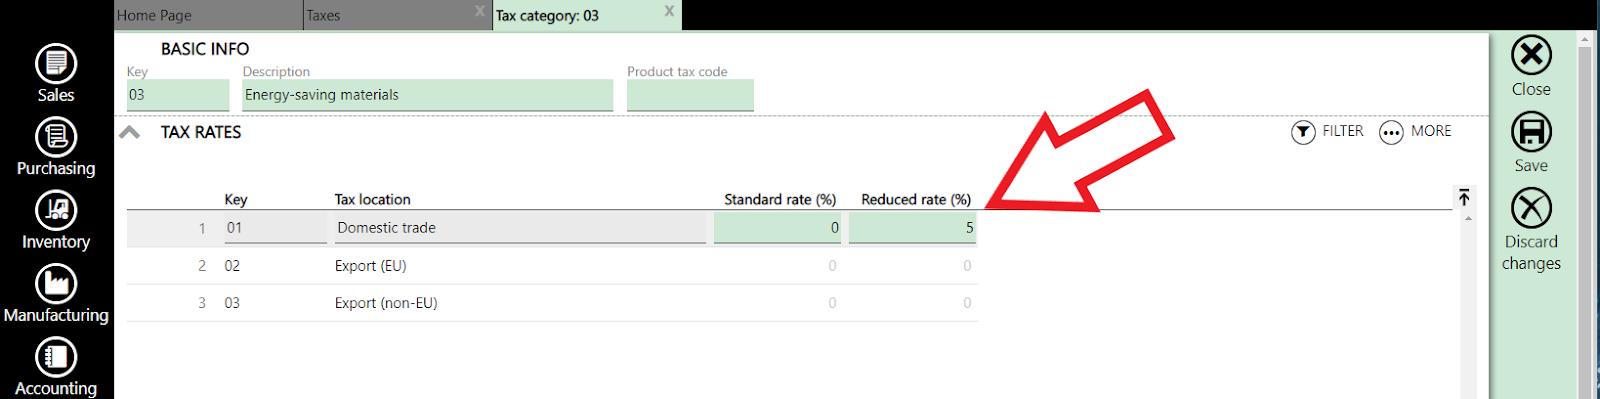 tax category settings